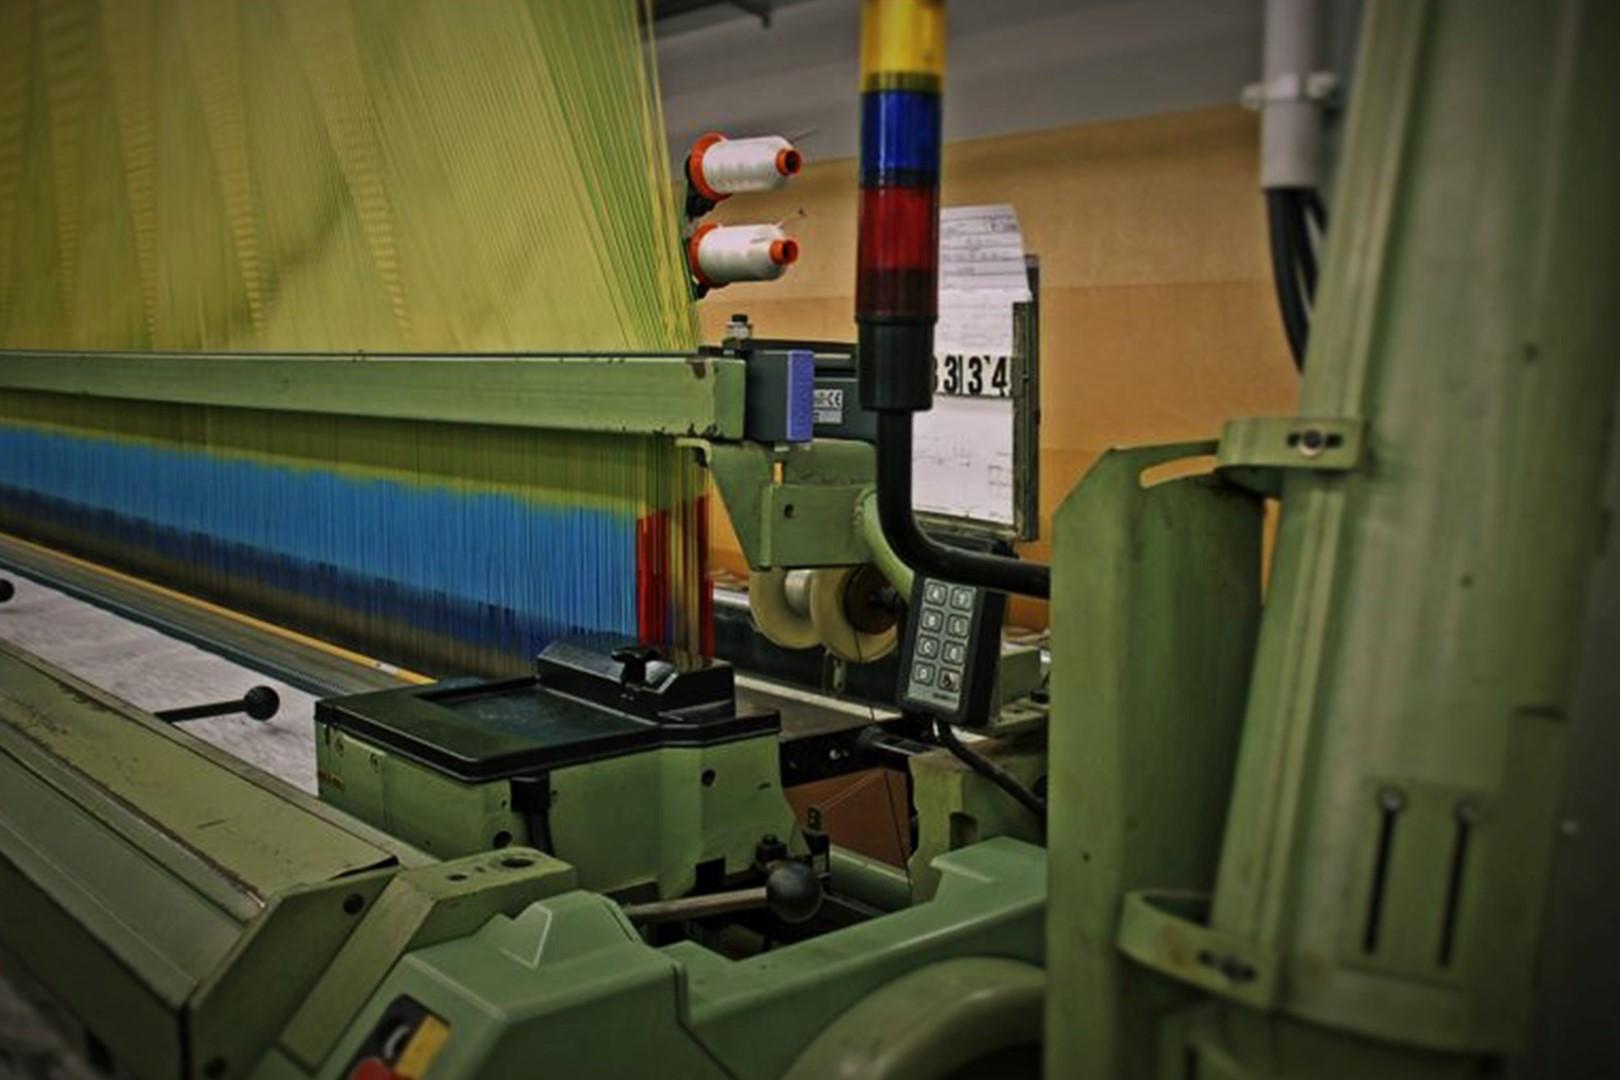 textile-machinery_0002_Sulzer P7100_0145